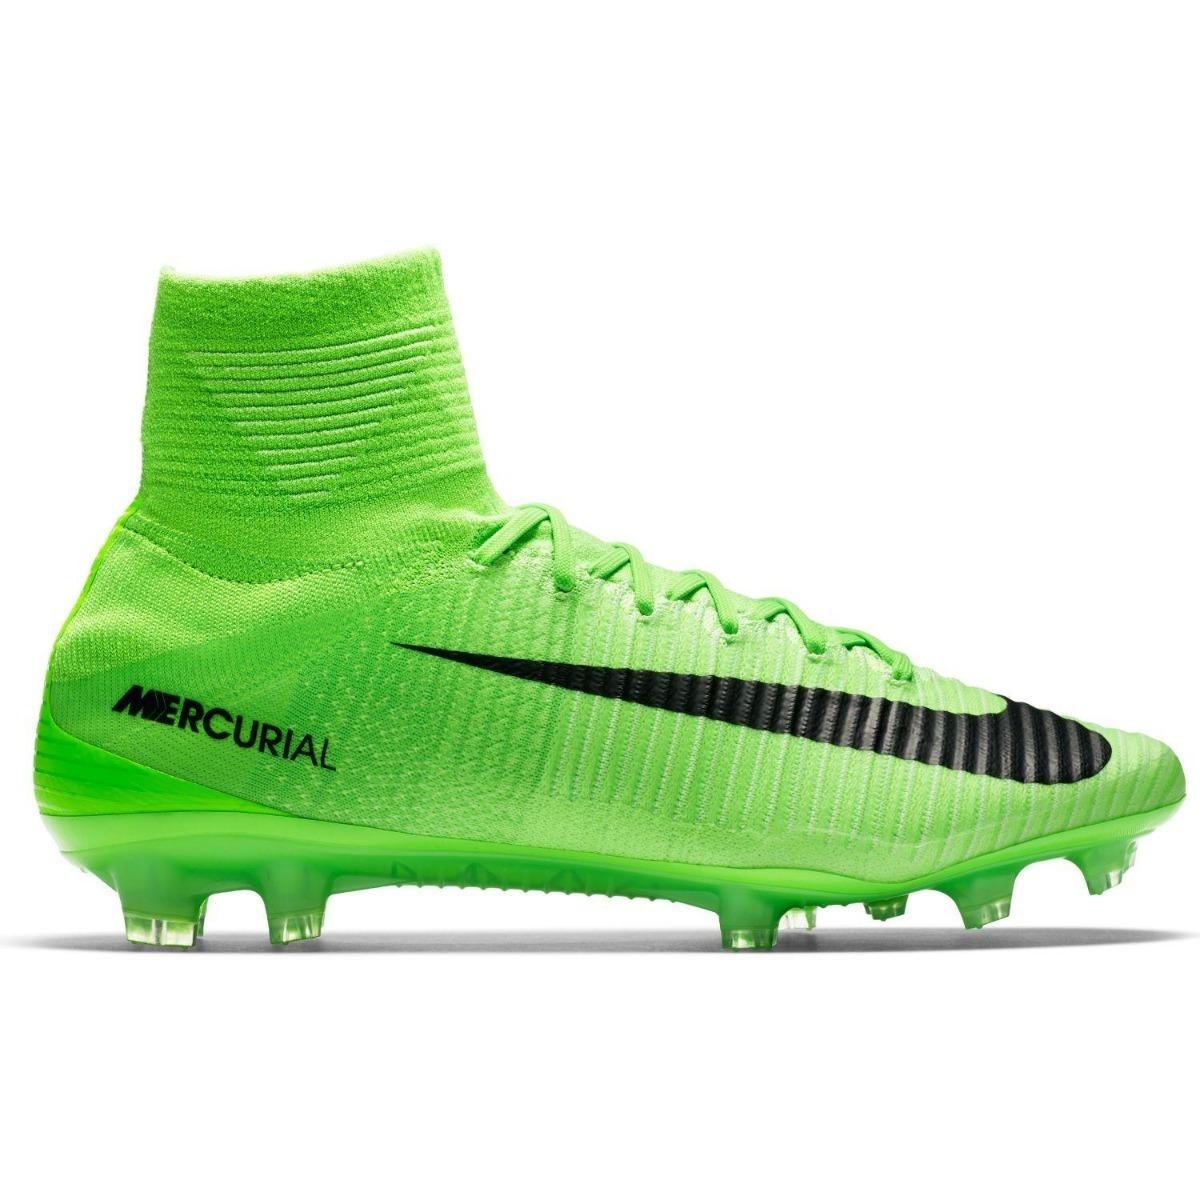 bea61b446527f Botines Nike Mercurial Superfly V Profesionales Bota Futbol ...